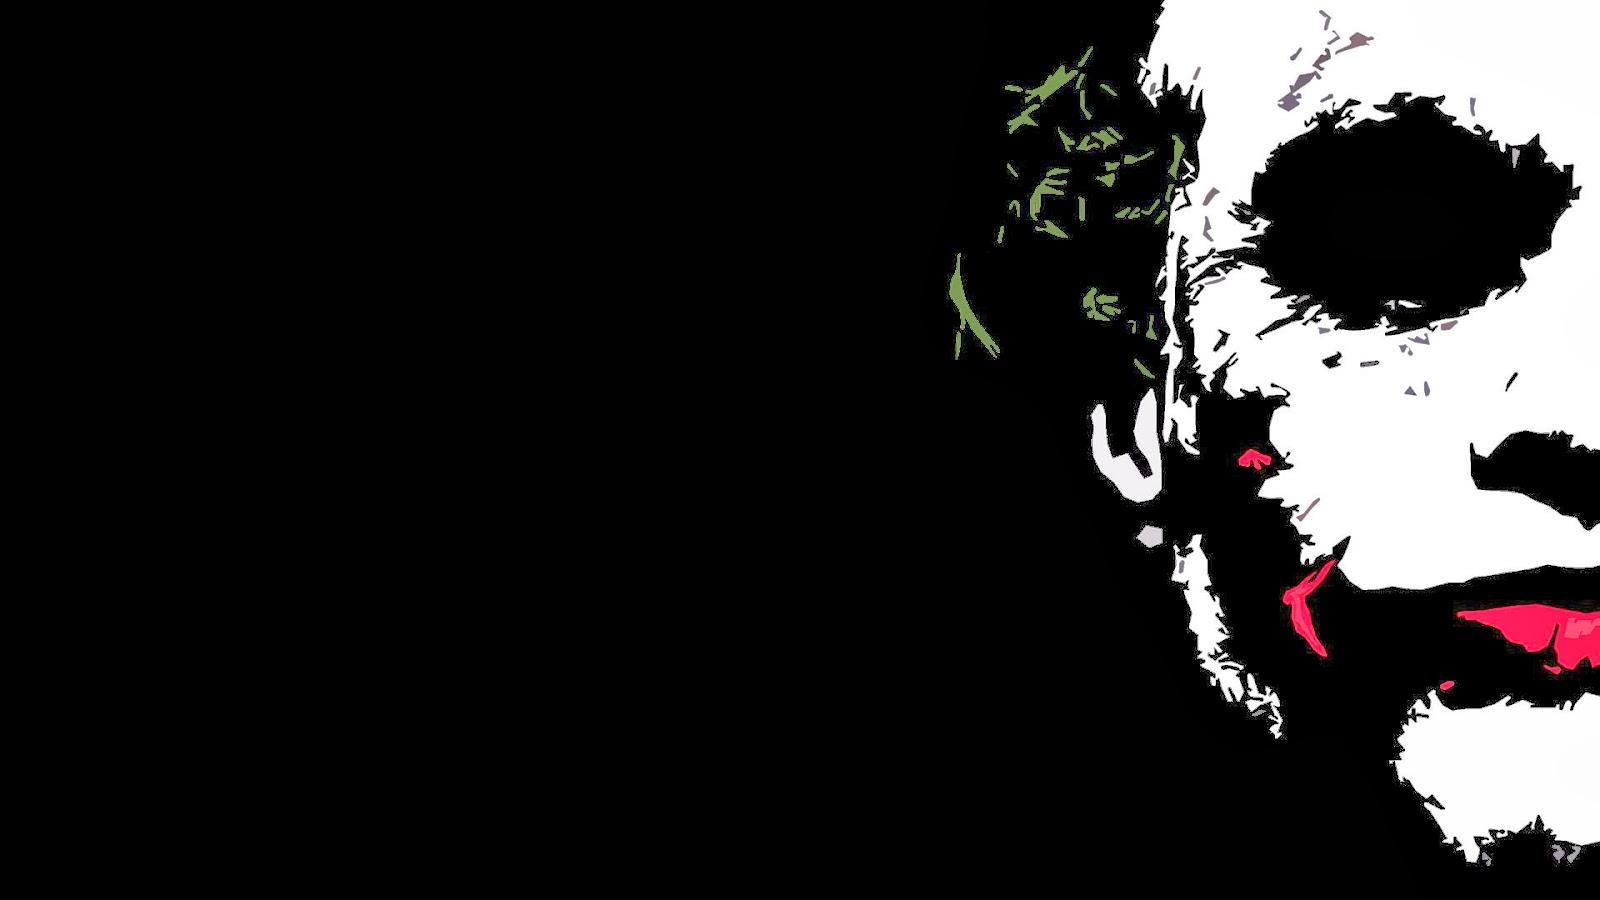 Ashley Wallpaper Wallpaper Joker Hd Gratis Download